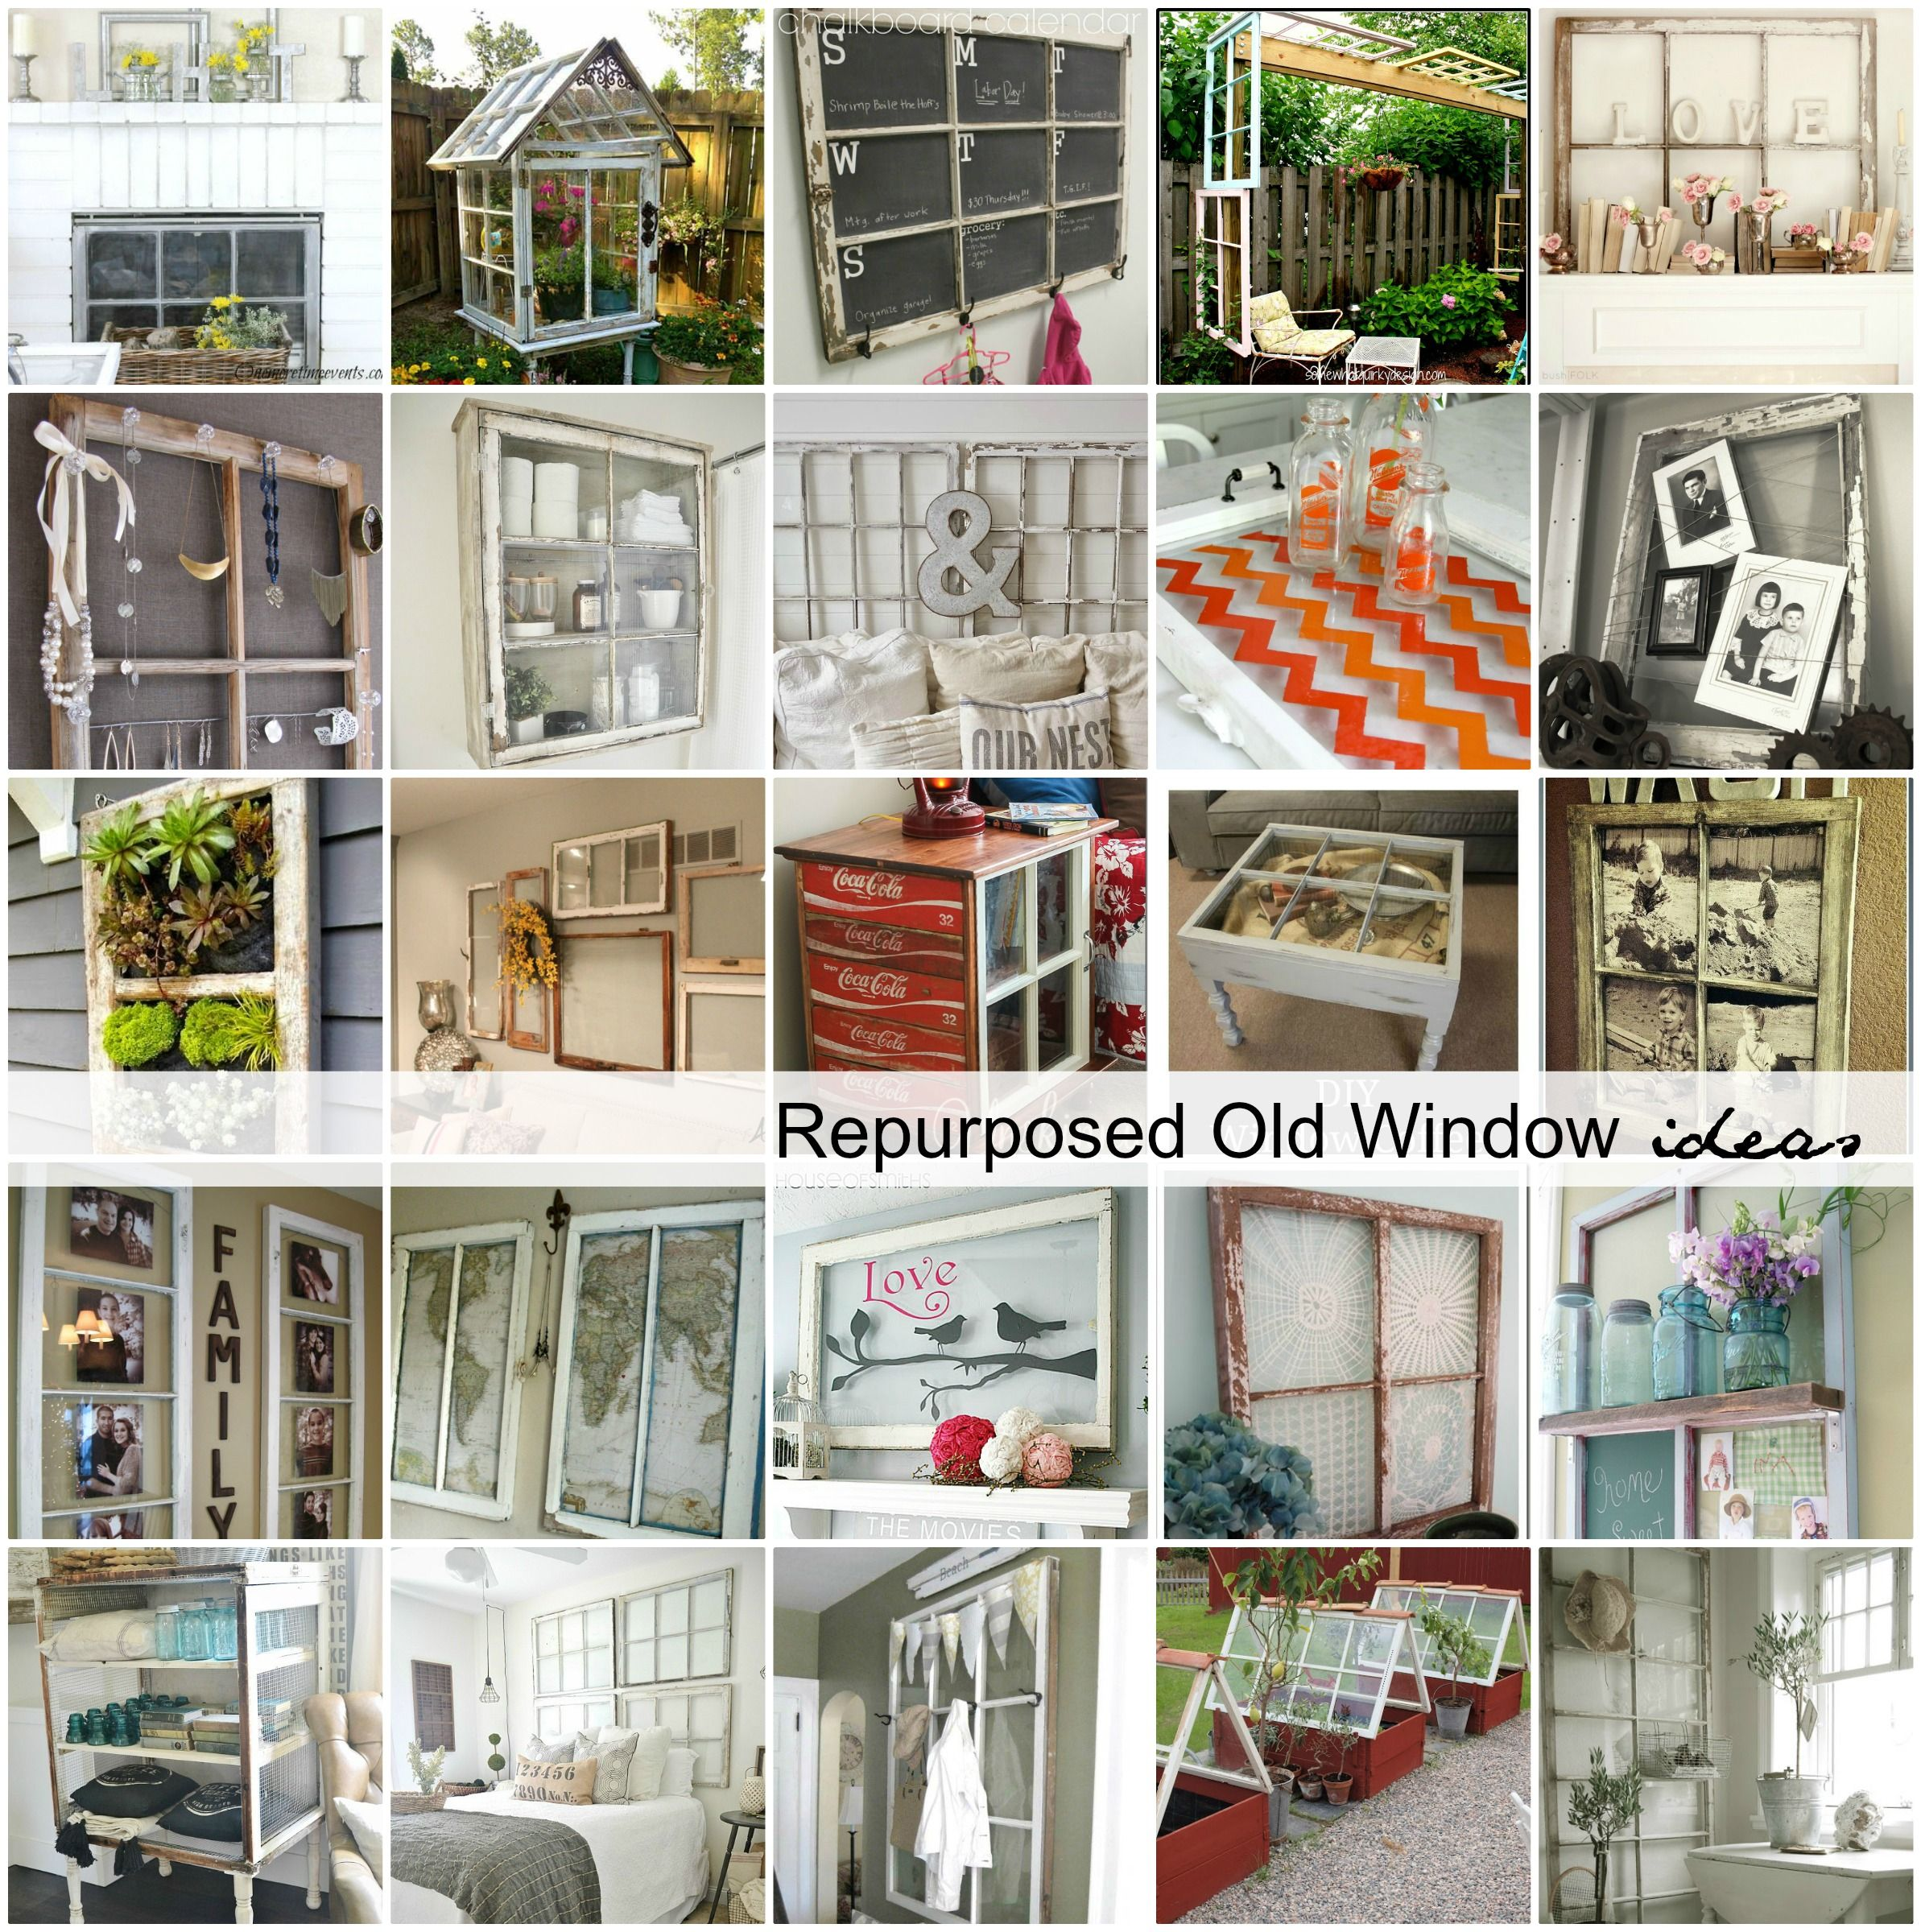 Repurposed old window ideas creative inspiration and window